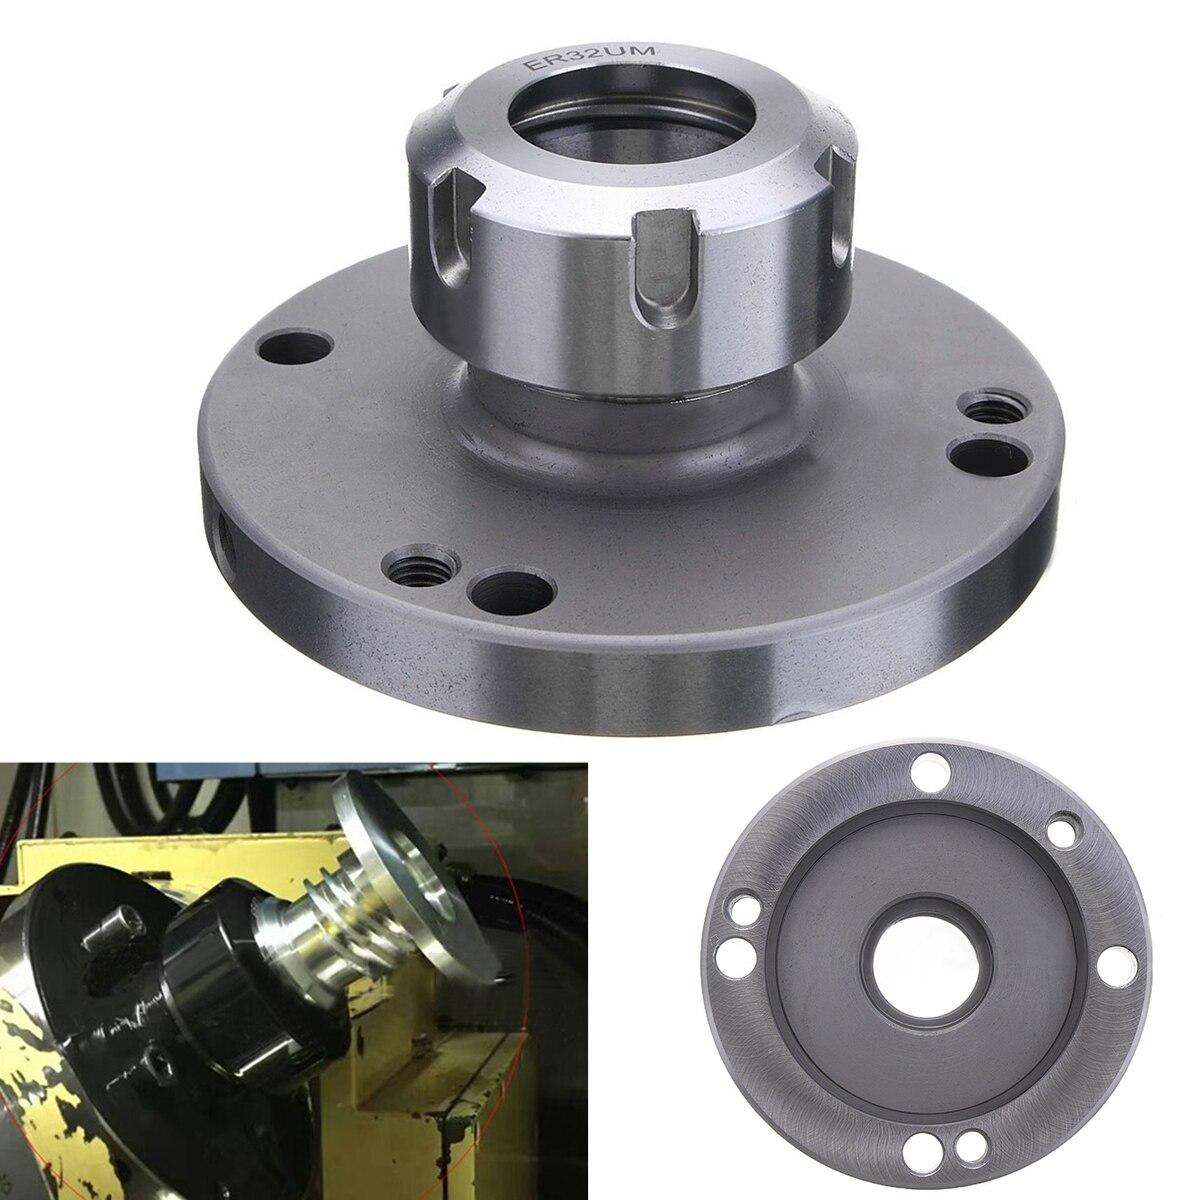 New 100mm Diameter ER 32 Collect Chuck Mayitr High Speed Steel 41Cr4 Chucks Prime Quality